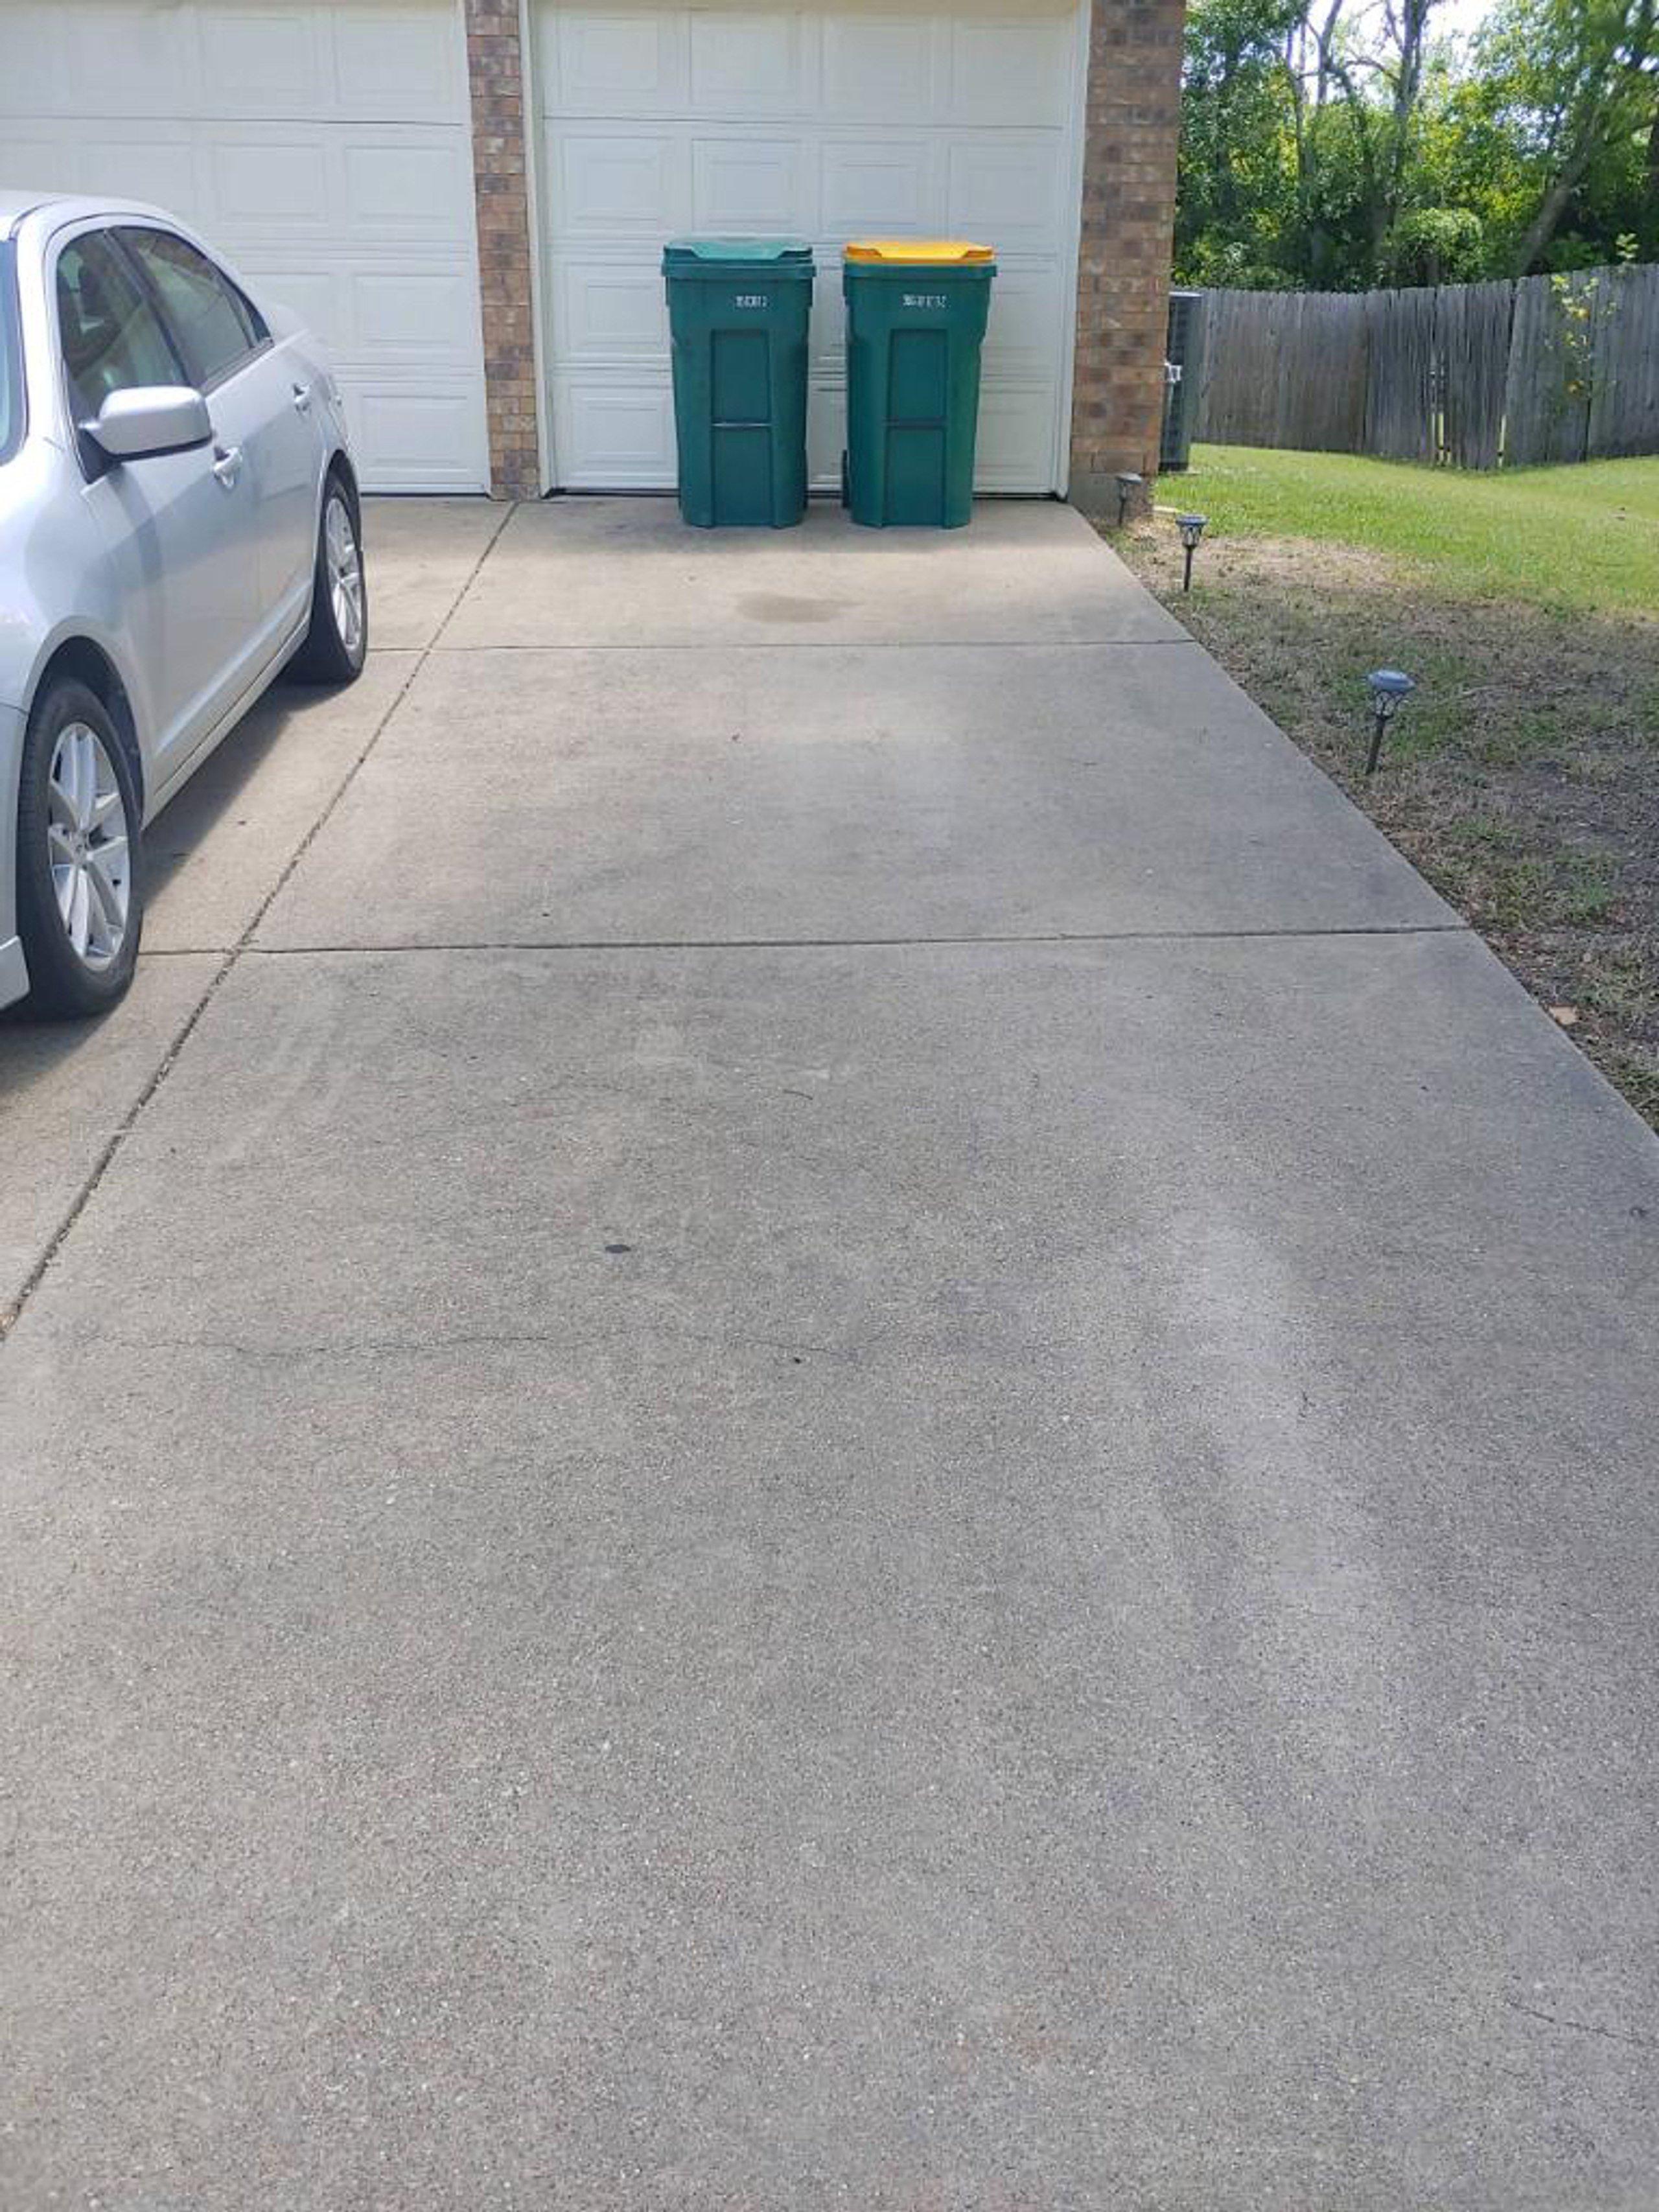 15x8 Driveway self storage unit